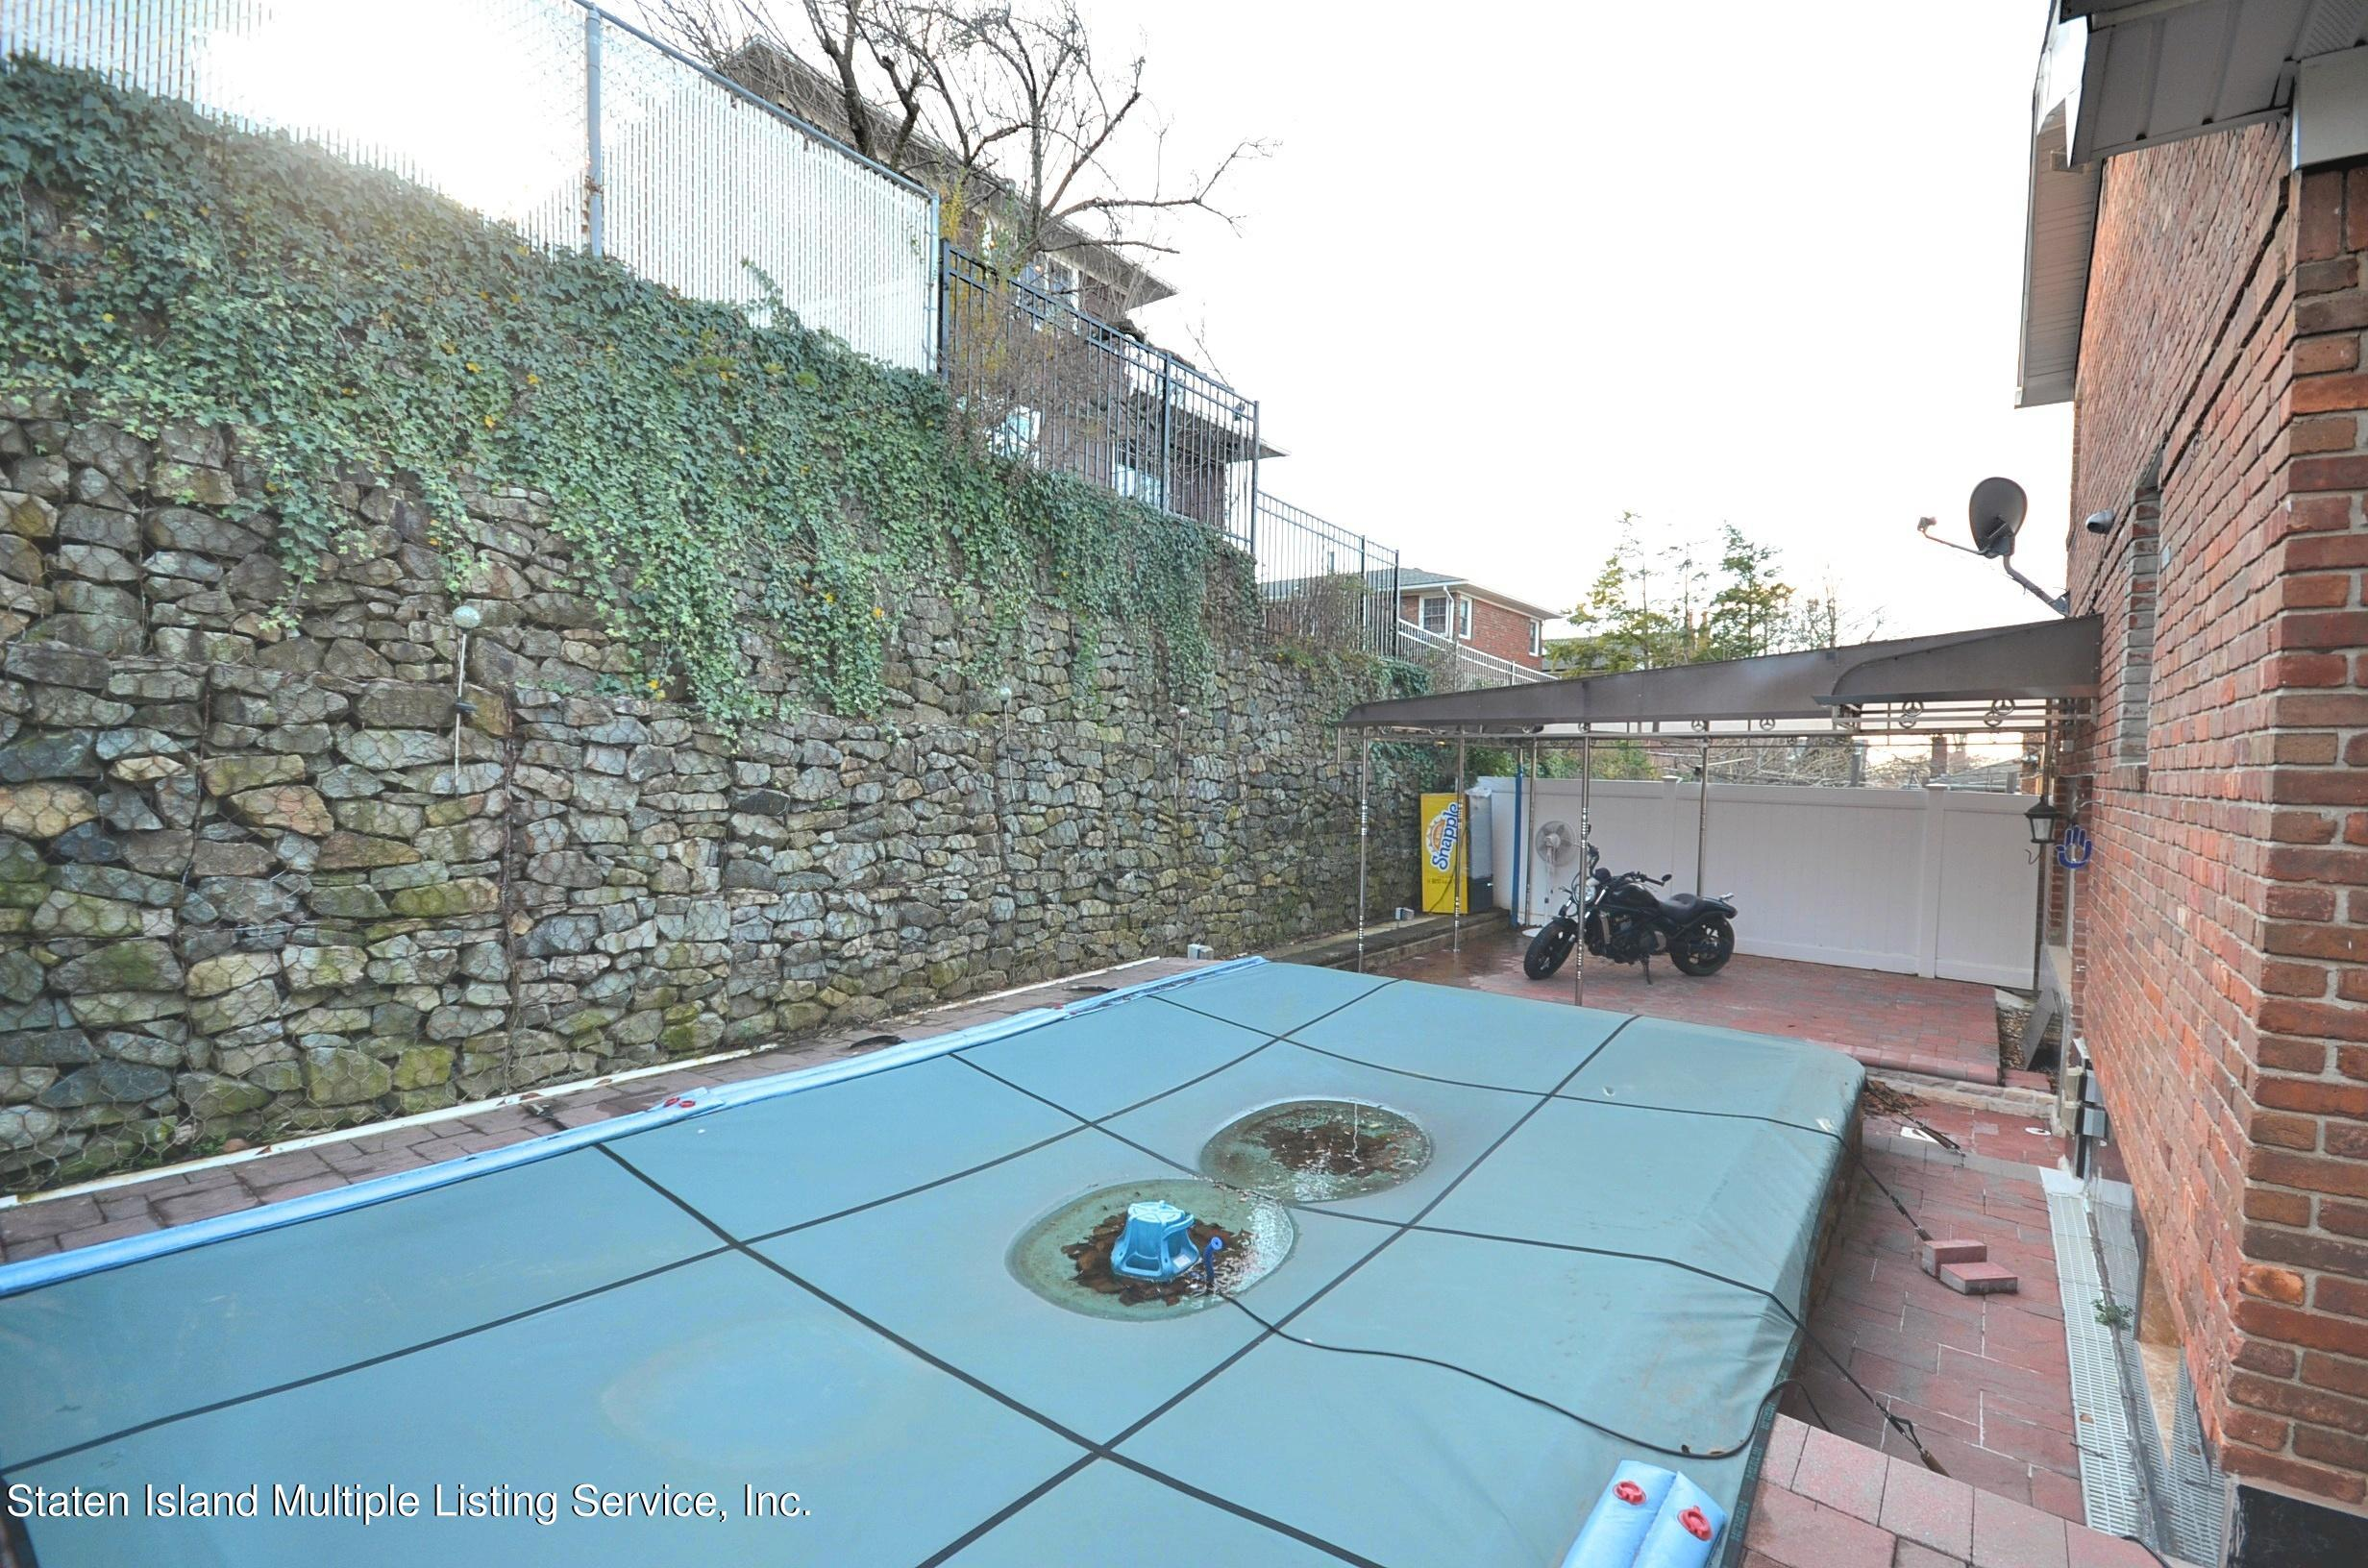 Single Family - Detached 48 Ocean Terrace  Staten Island, NY 10314, MLS-1142240-33